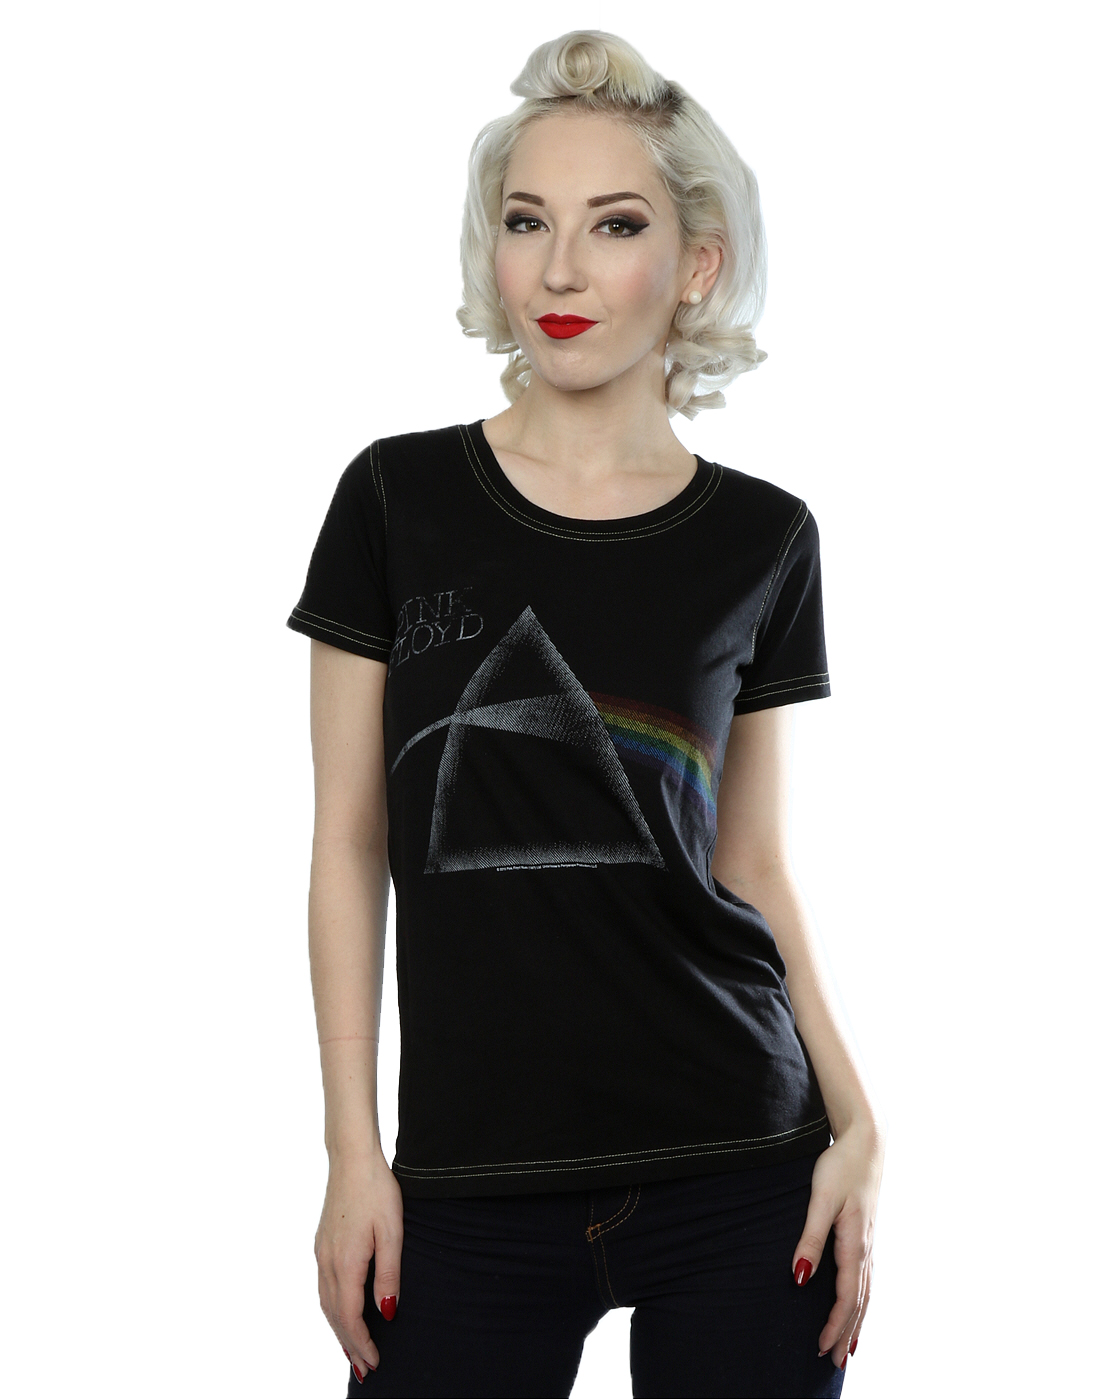 cab791f7 Aftershow Women's Pink Floyd Prism T-Shirt   eBay